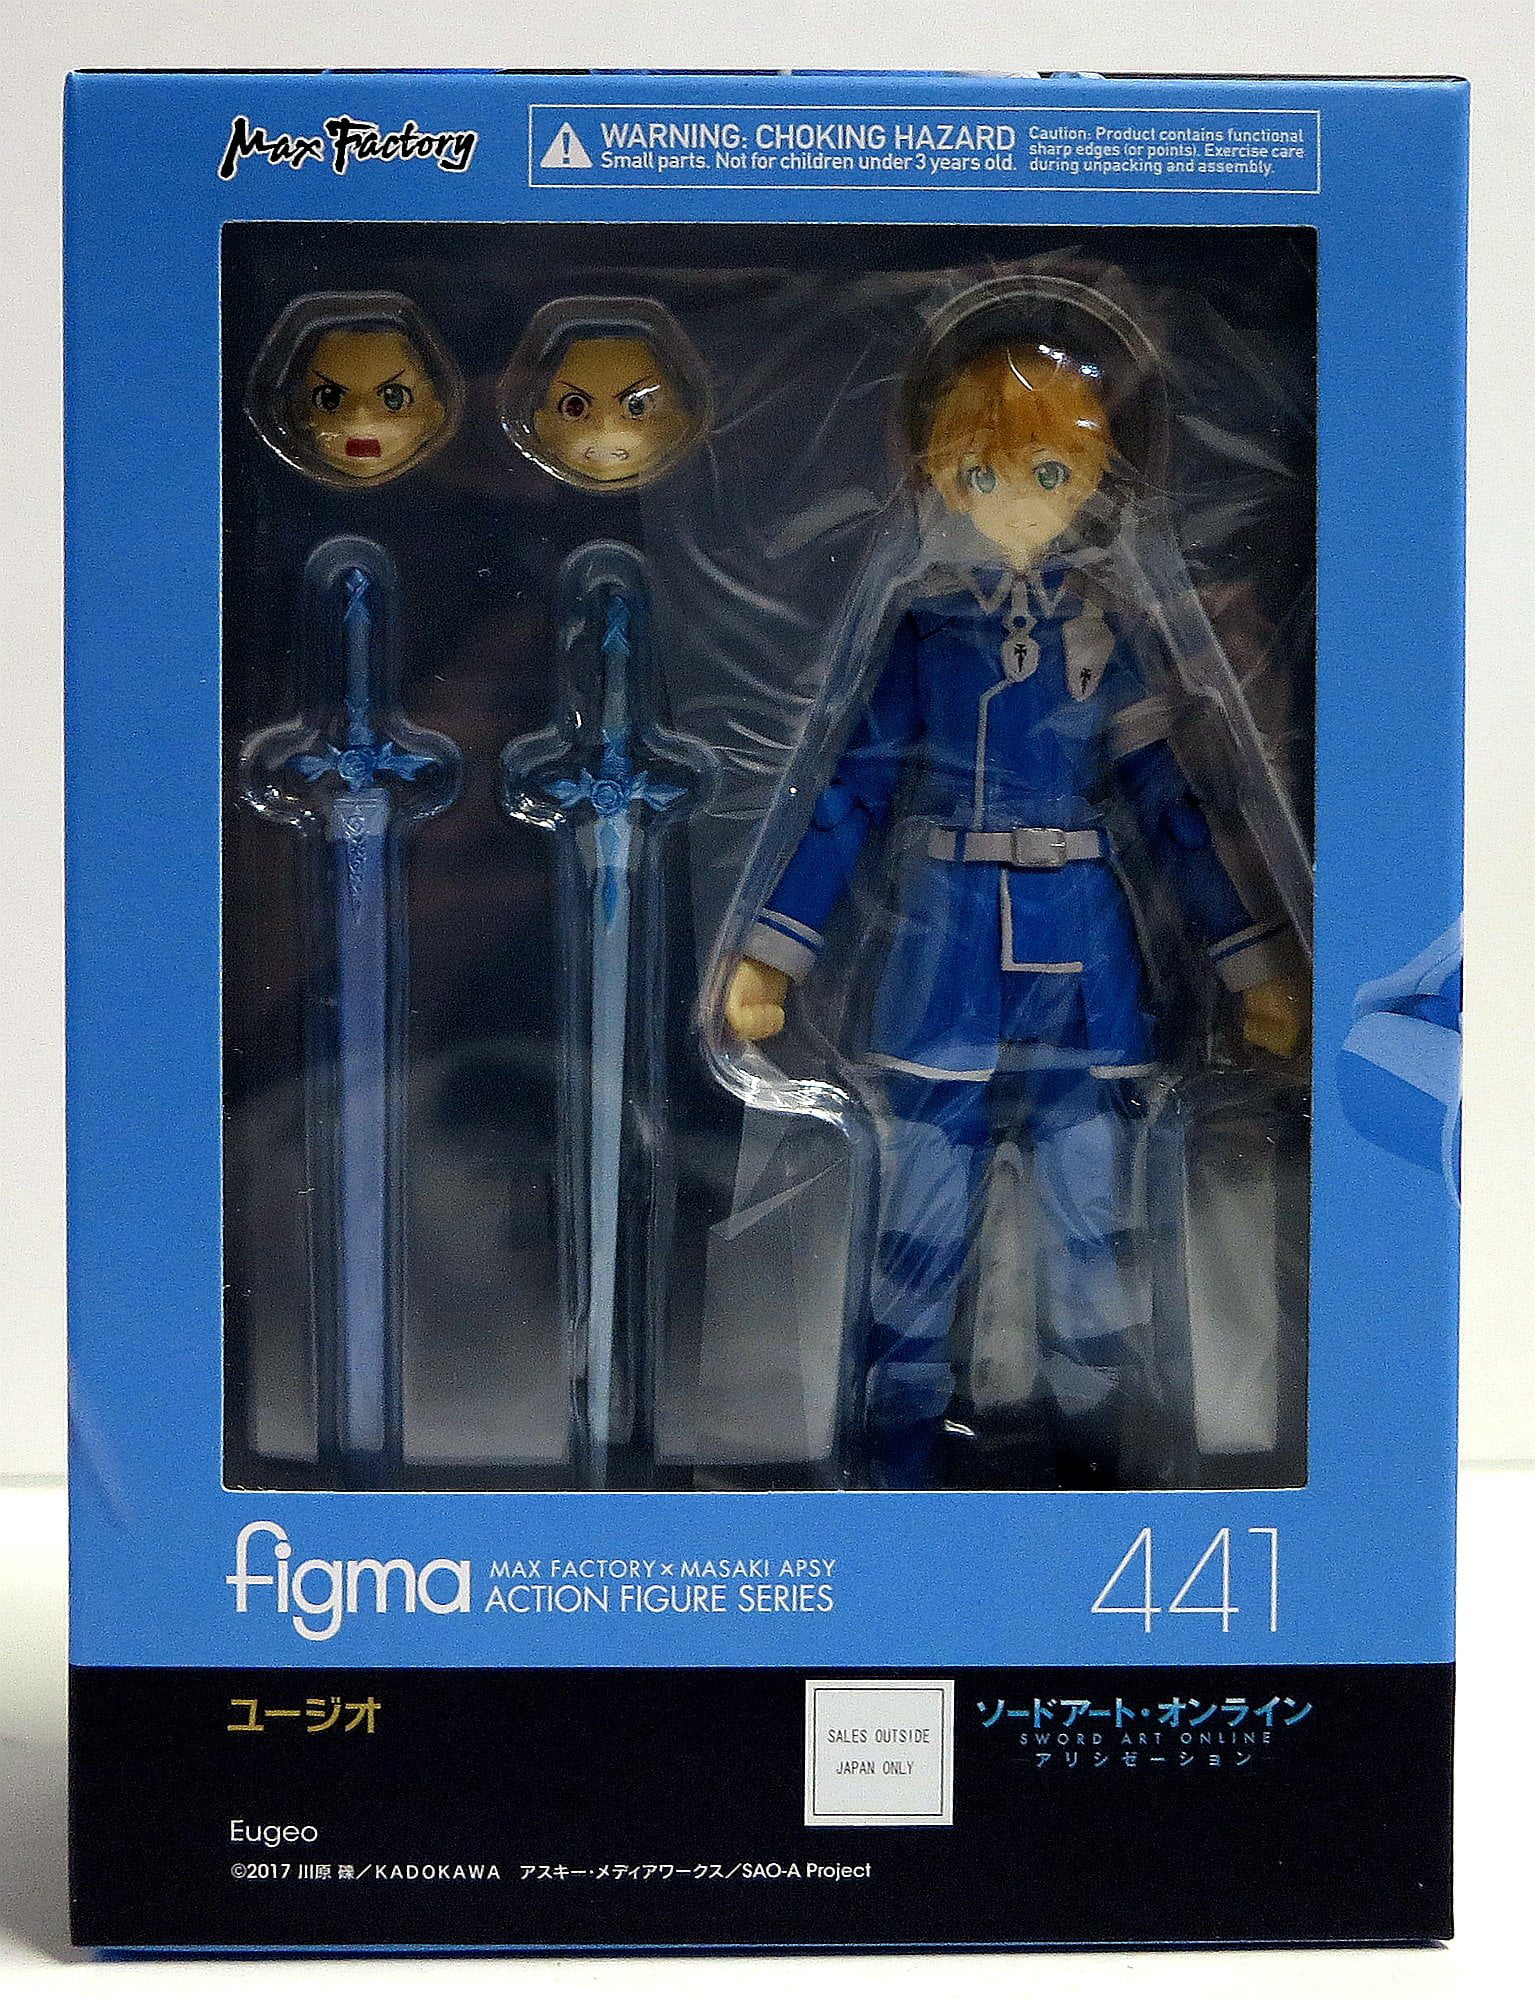 Figma Action Figure Base Stand Holder /& Hand Figma Accessory